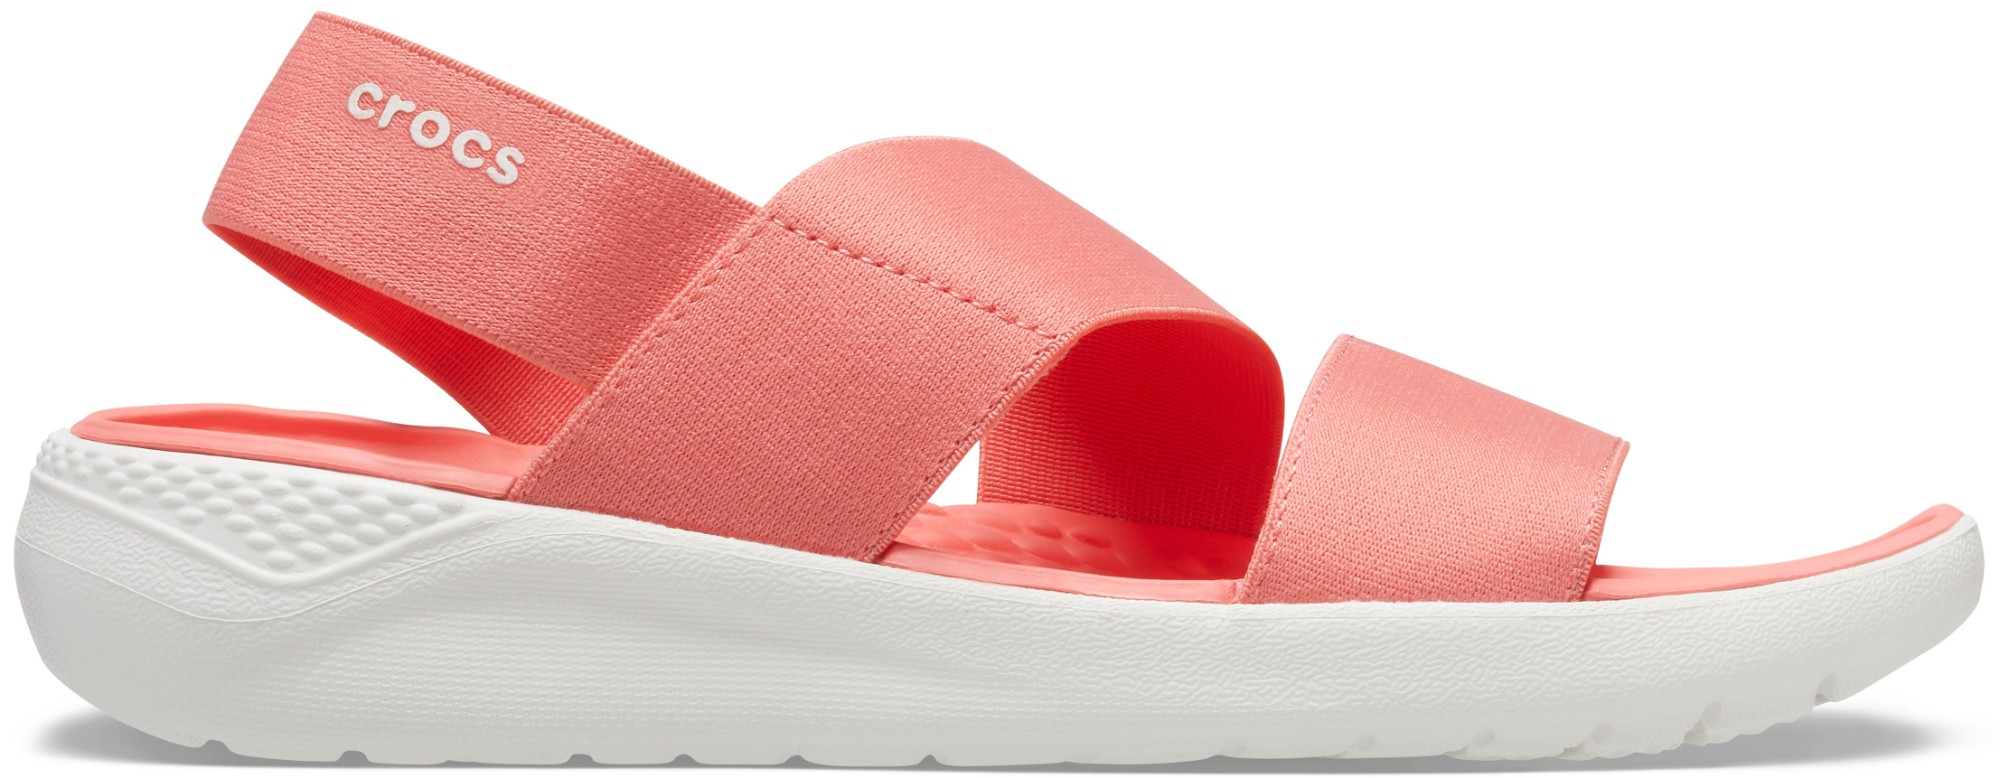 Crocs™ Literide Stretch Sandal Womens Fresco 37,5